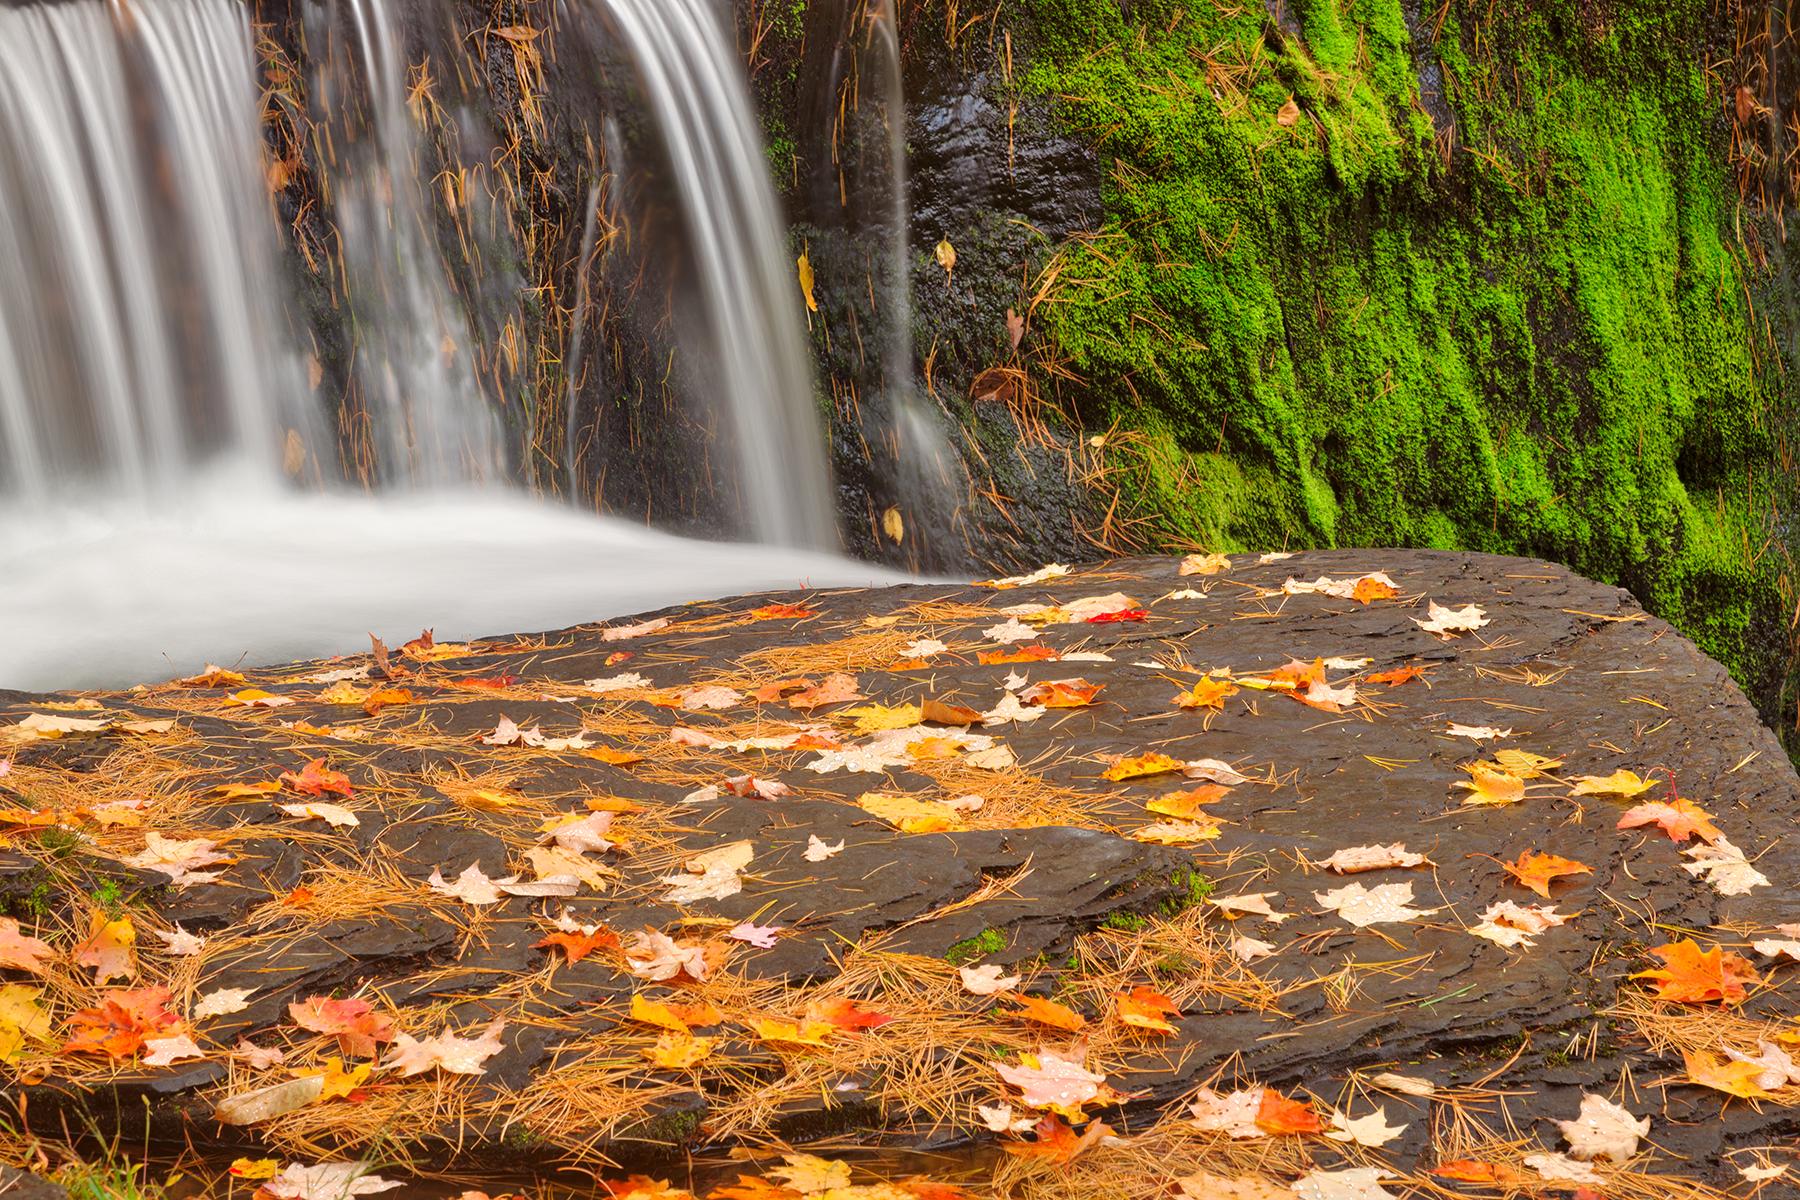 Autumn Moss Factory Falls - HDR, , Plants, Scenery, Scene, HQ Photo